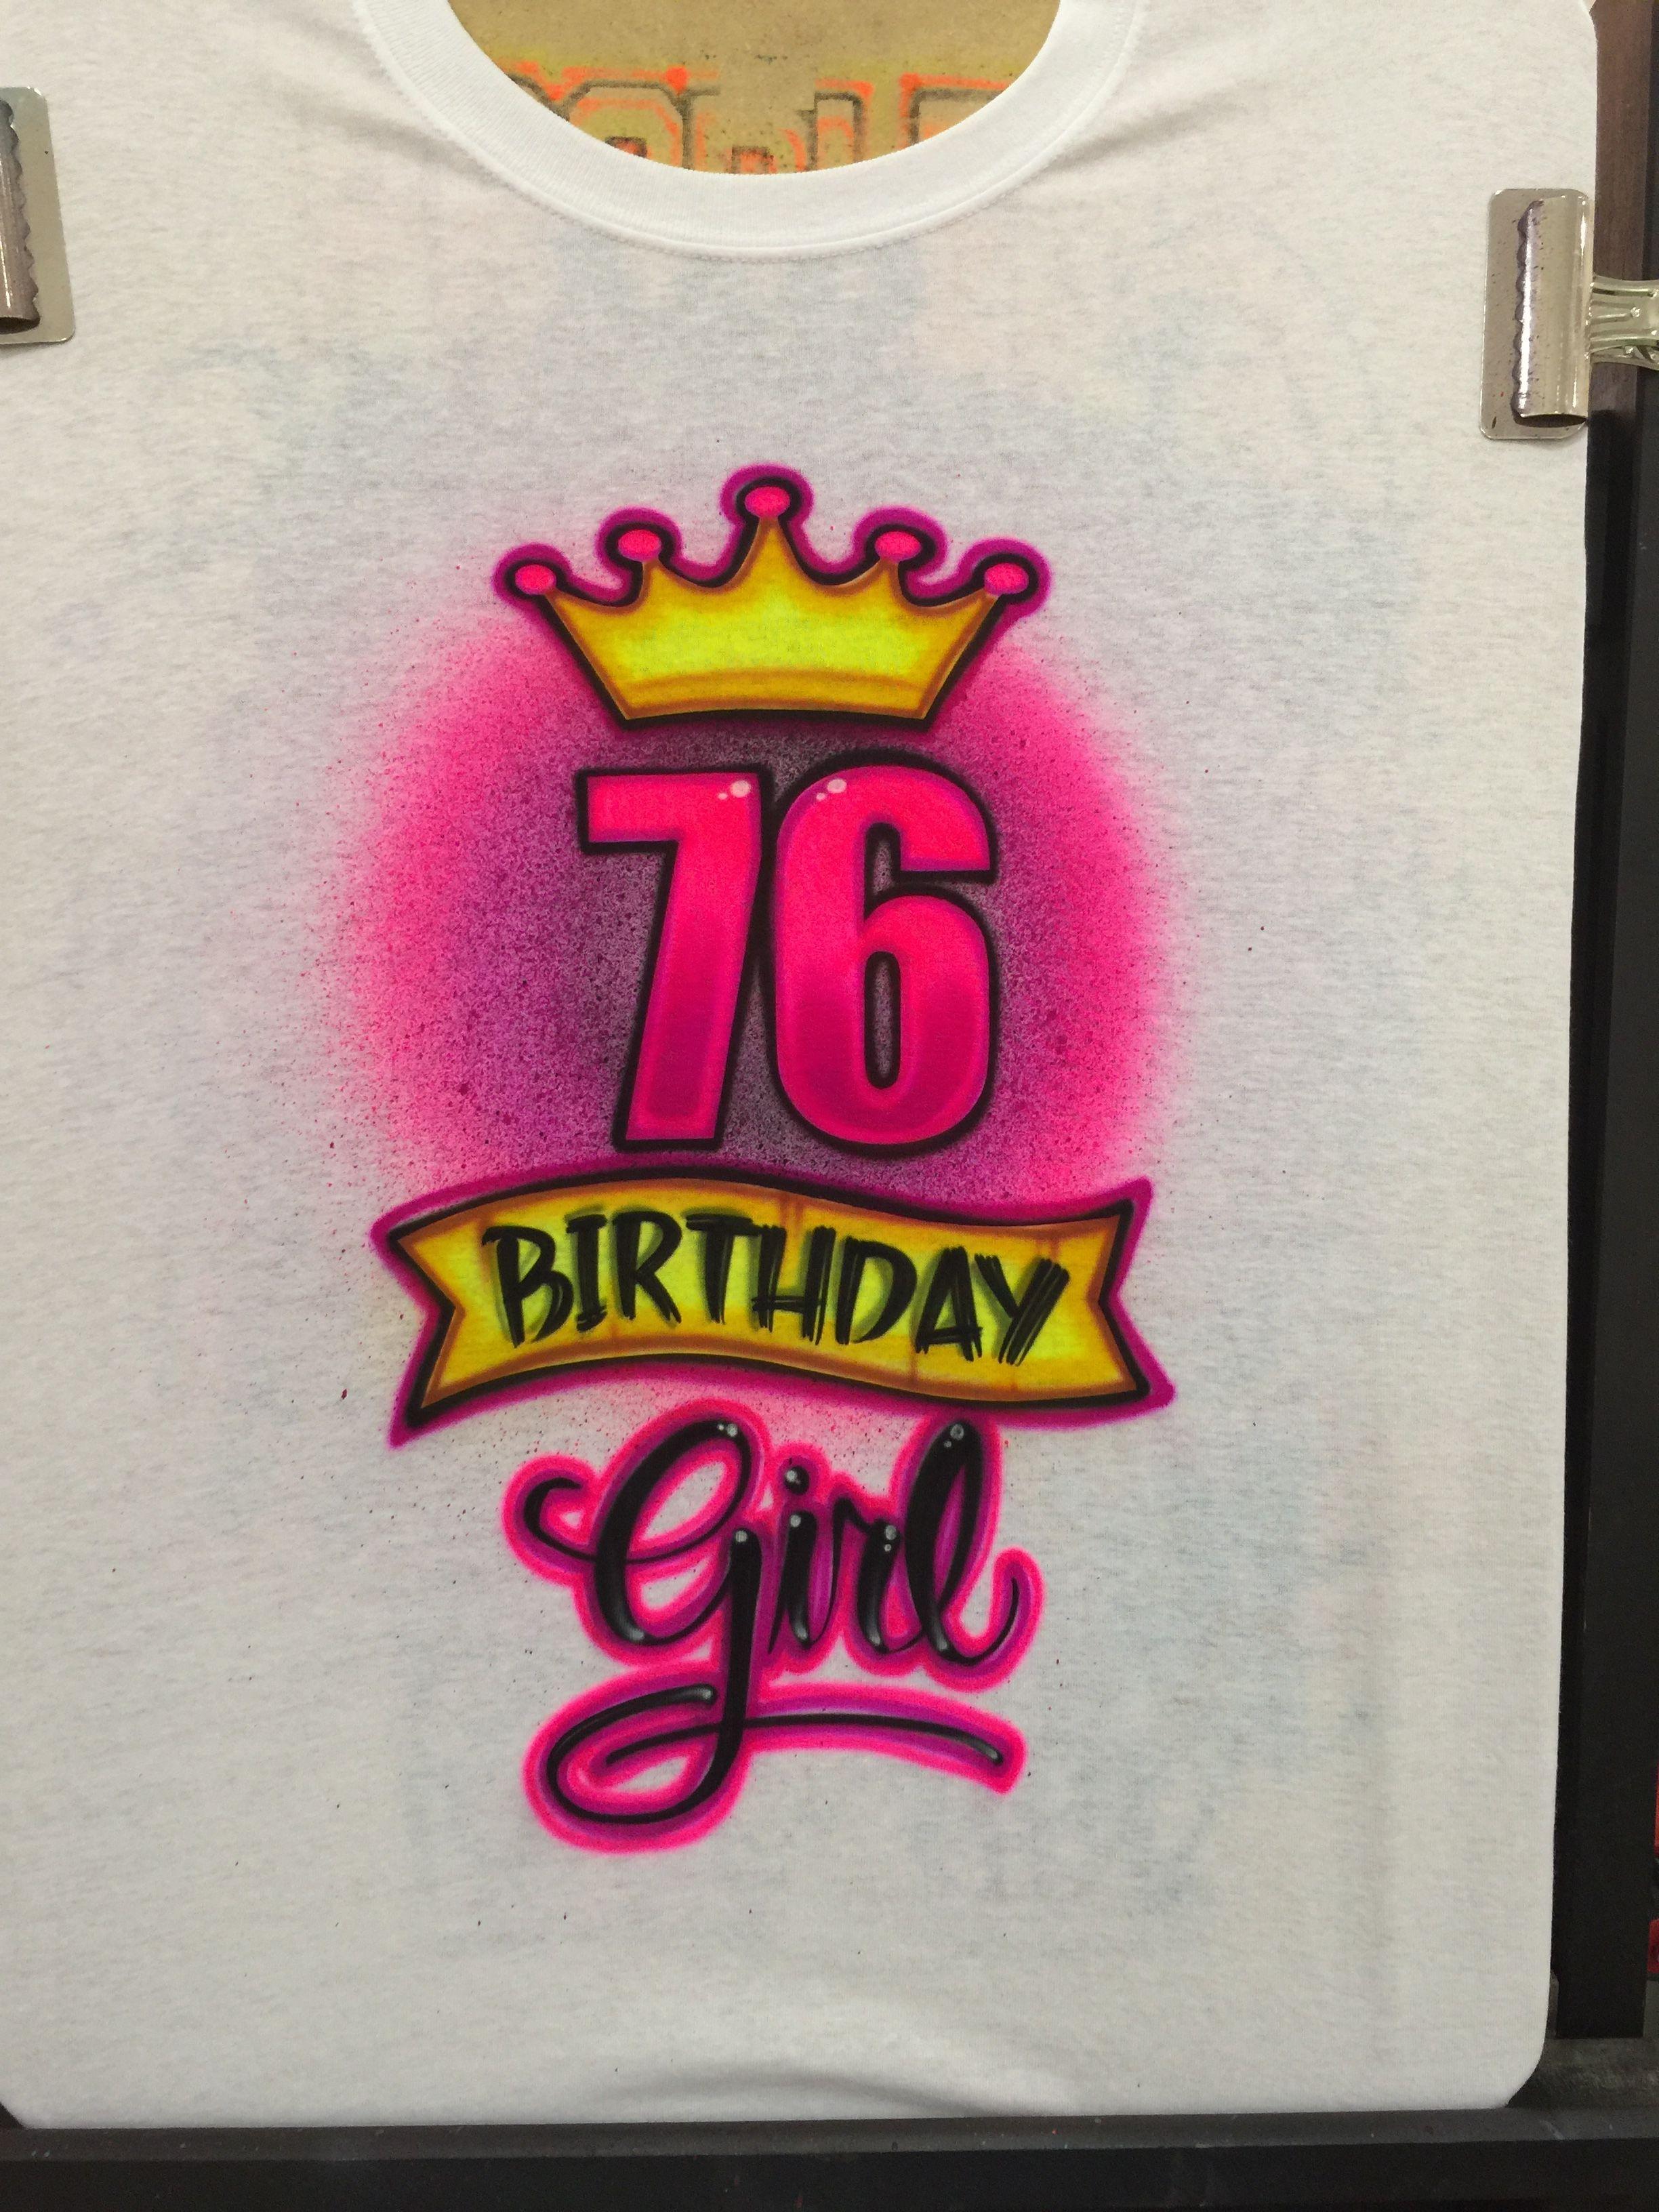 Birthday design birthdays birthday design tshirt